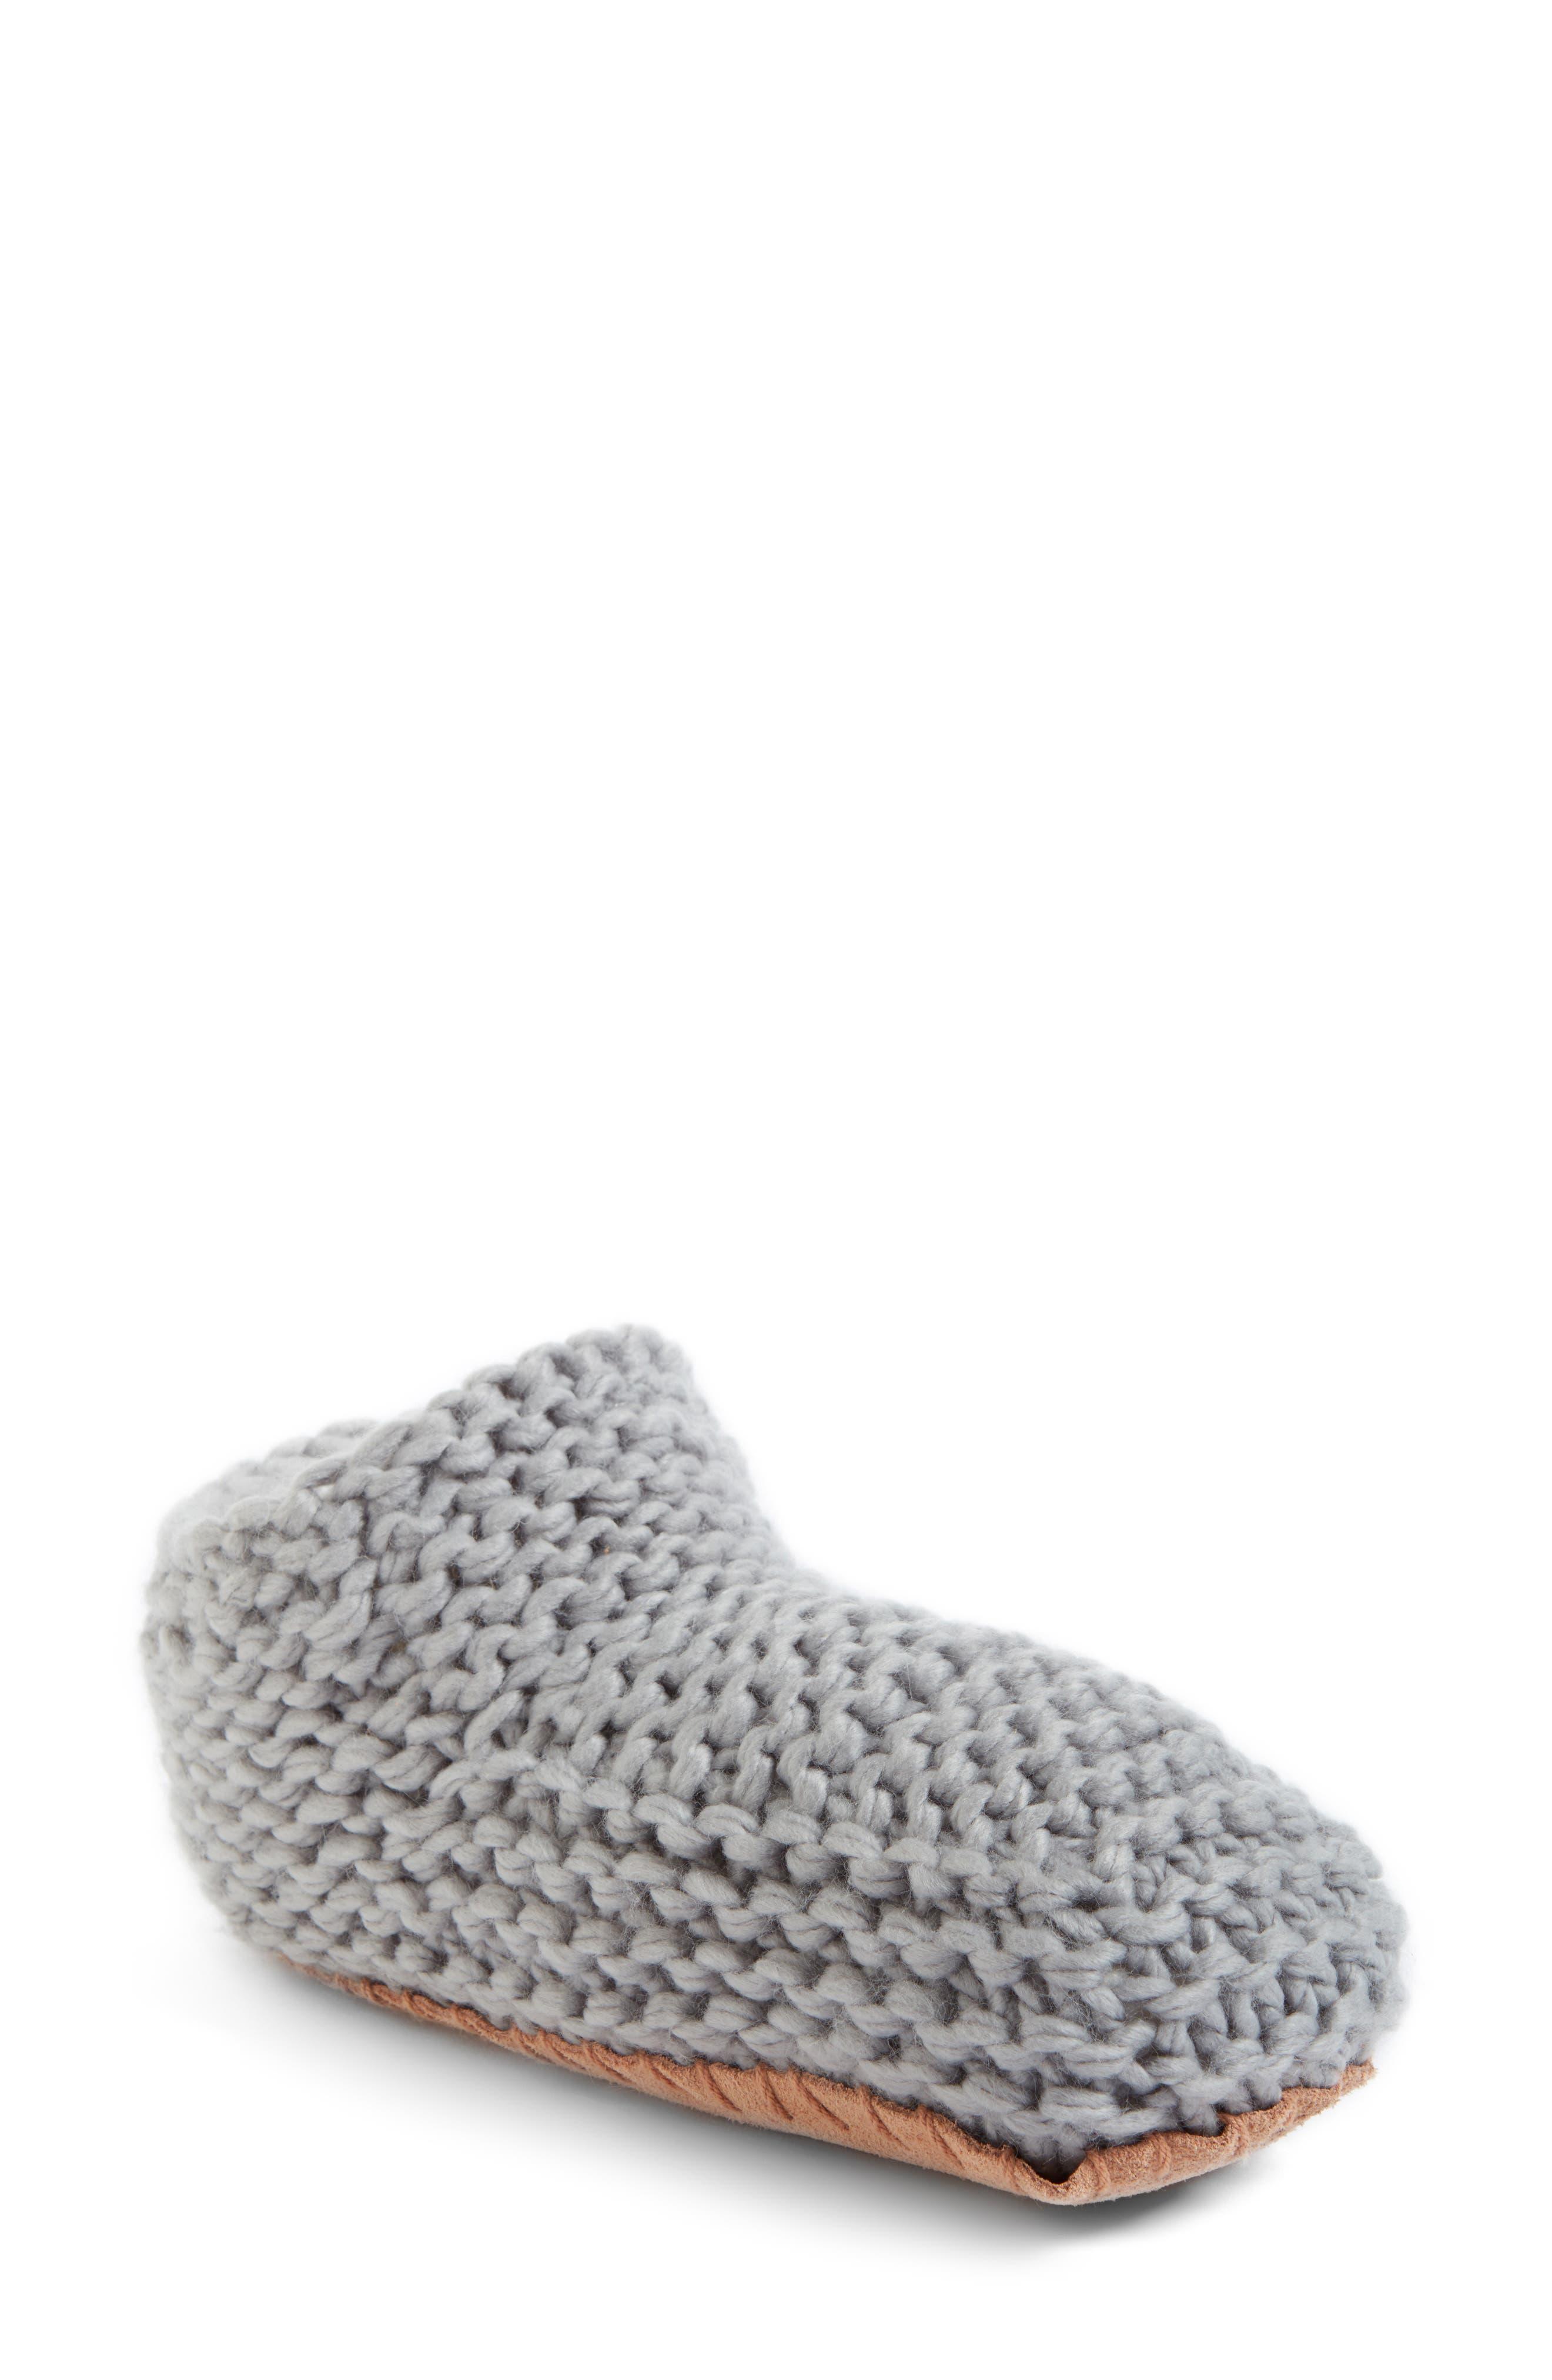 Lemon Knit Slipper Bootie